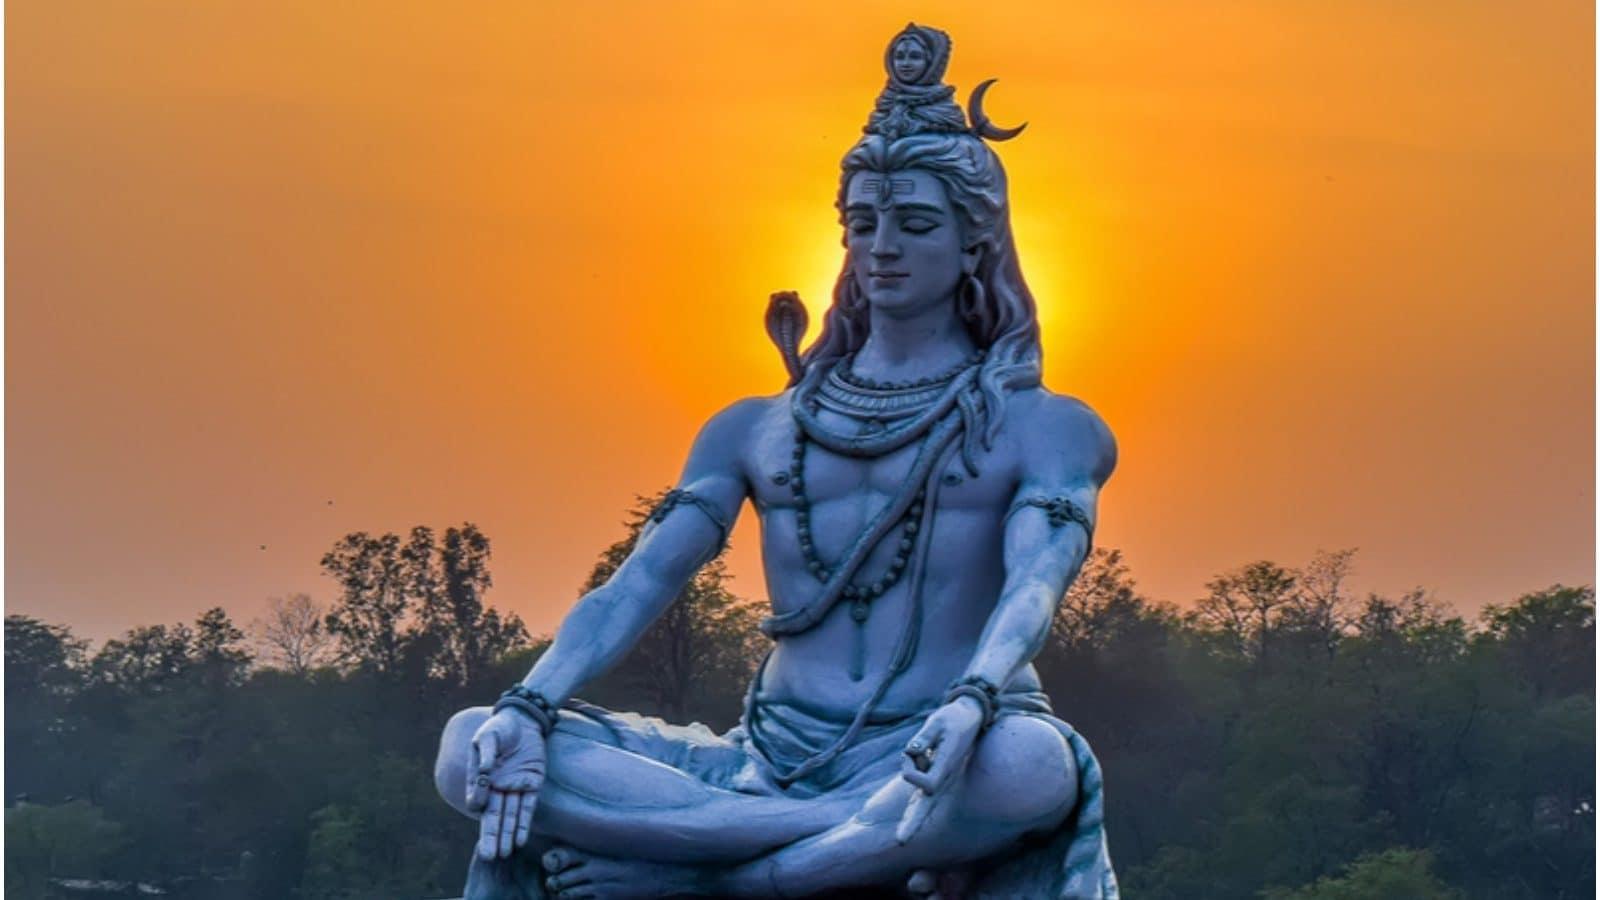 Aaj Ka Panchang, July 25, 2021: Check Out Tithi, Shubh Muhurat, Rahu Kaal and Other Details for Sunday